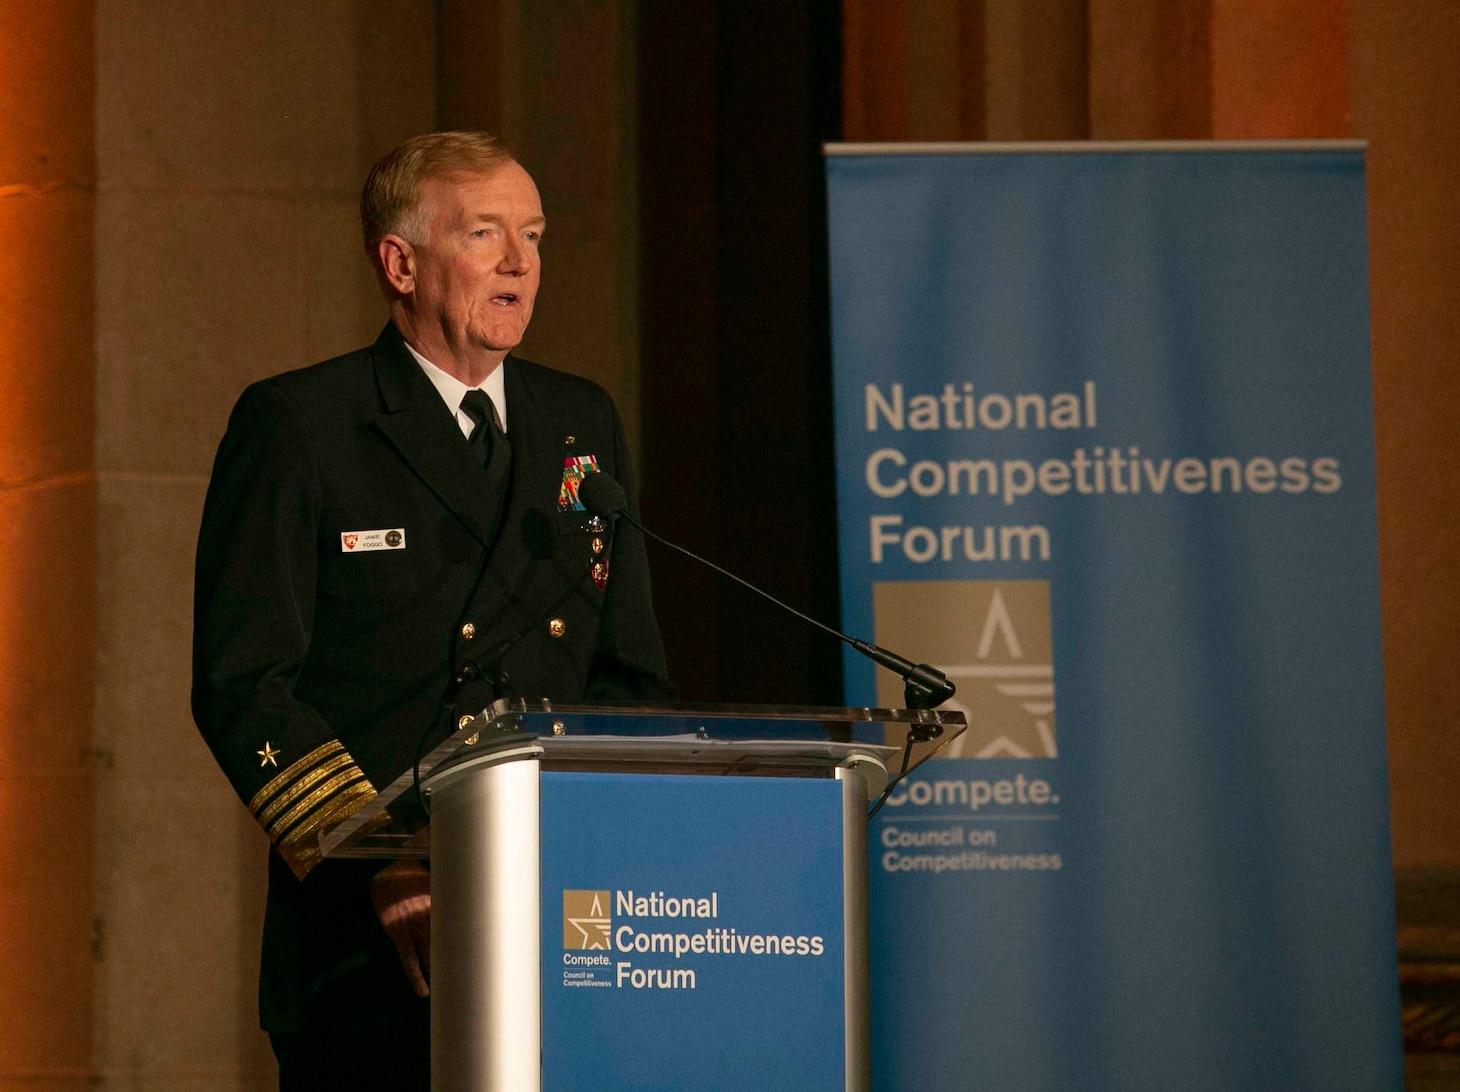 Adm. James G. Foggo III; U.S. Naval Forces Europe-Africa; Council on Competitiveness;